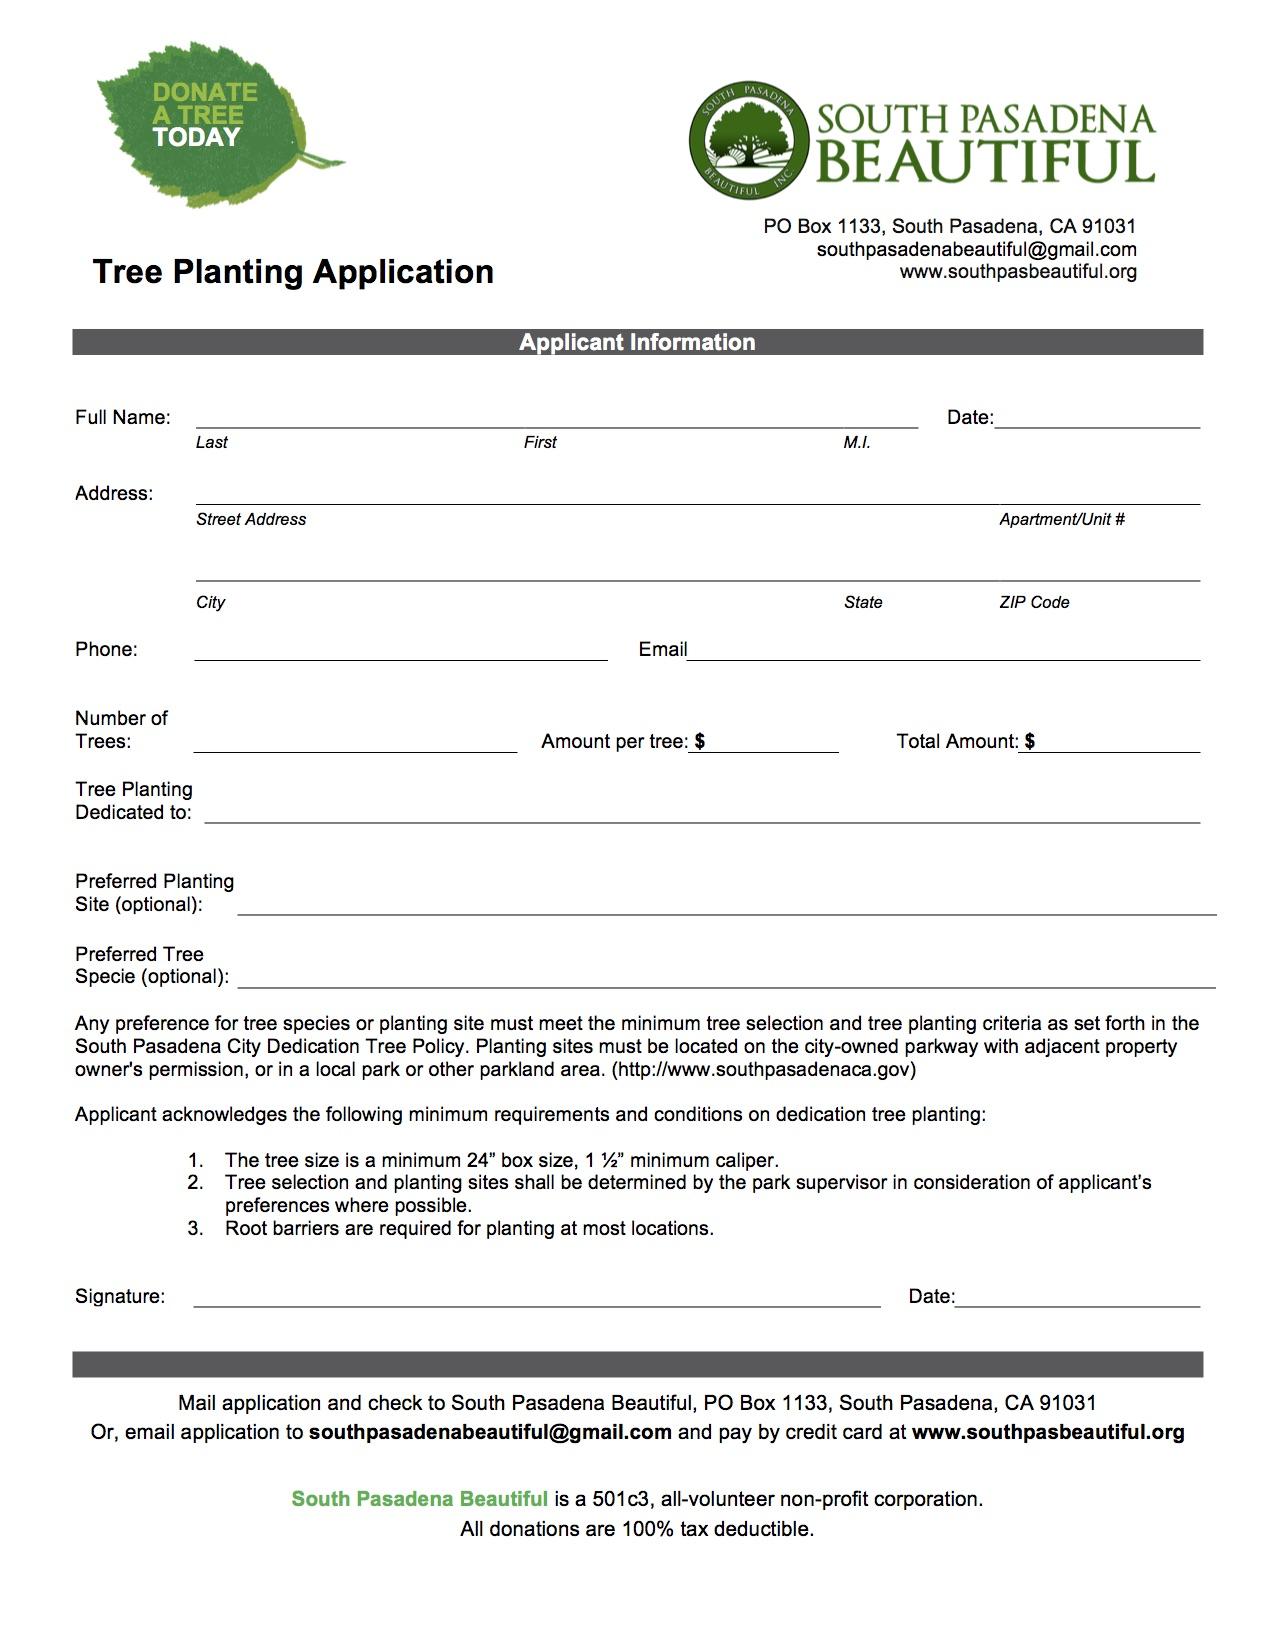 SPB Tree Planting Final Application copy.jpg